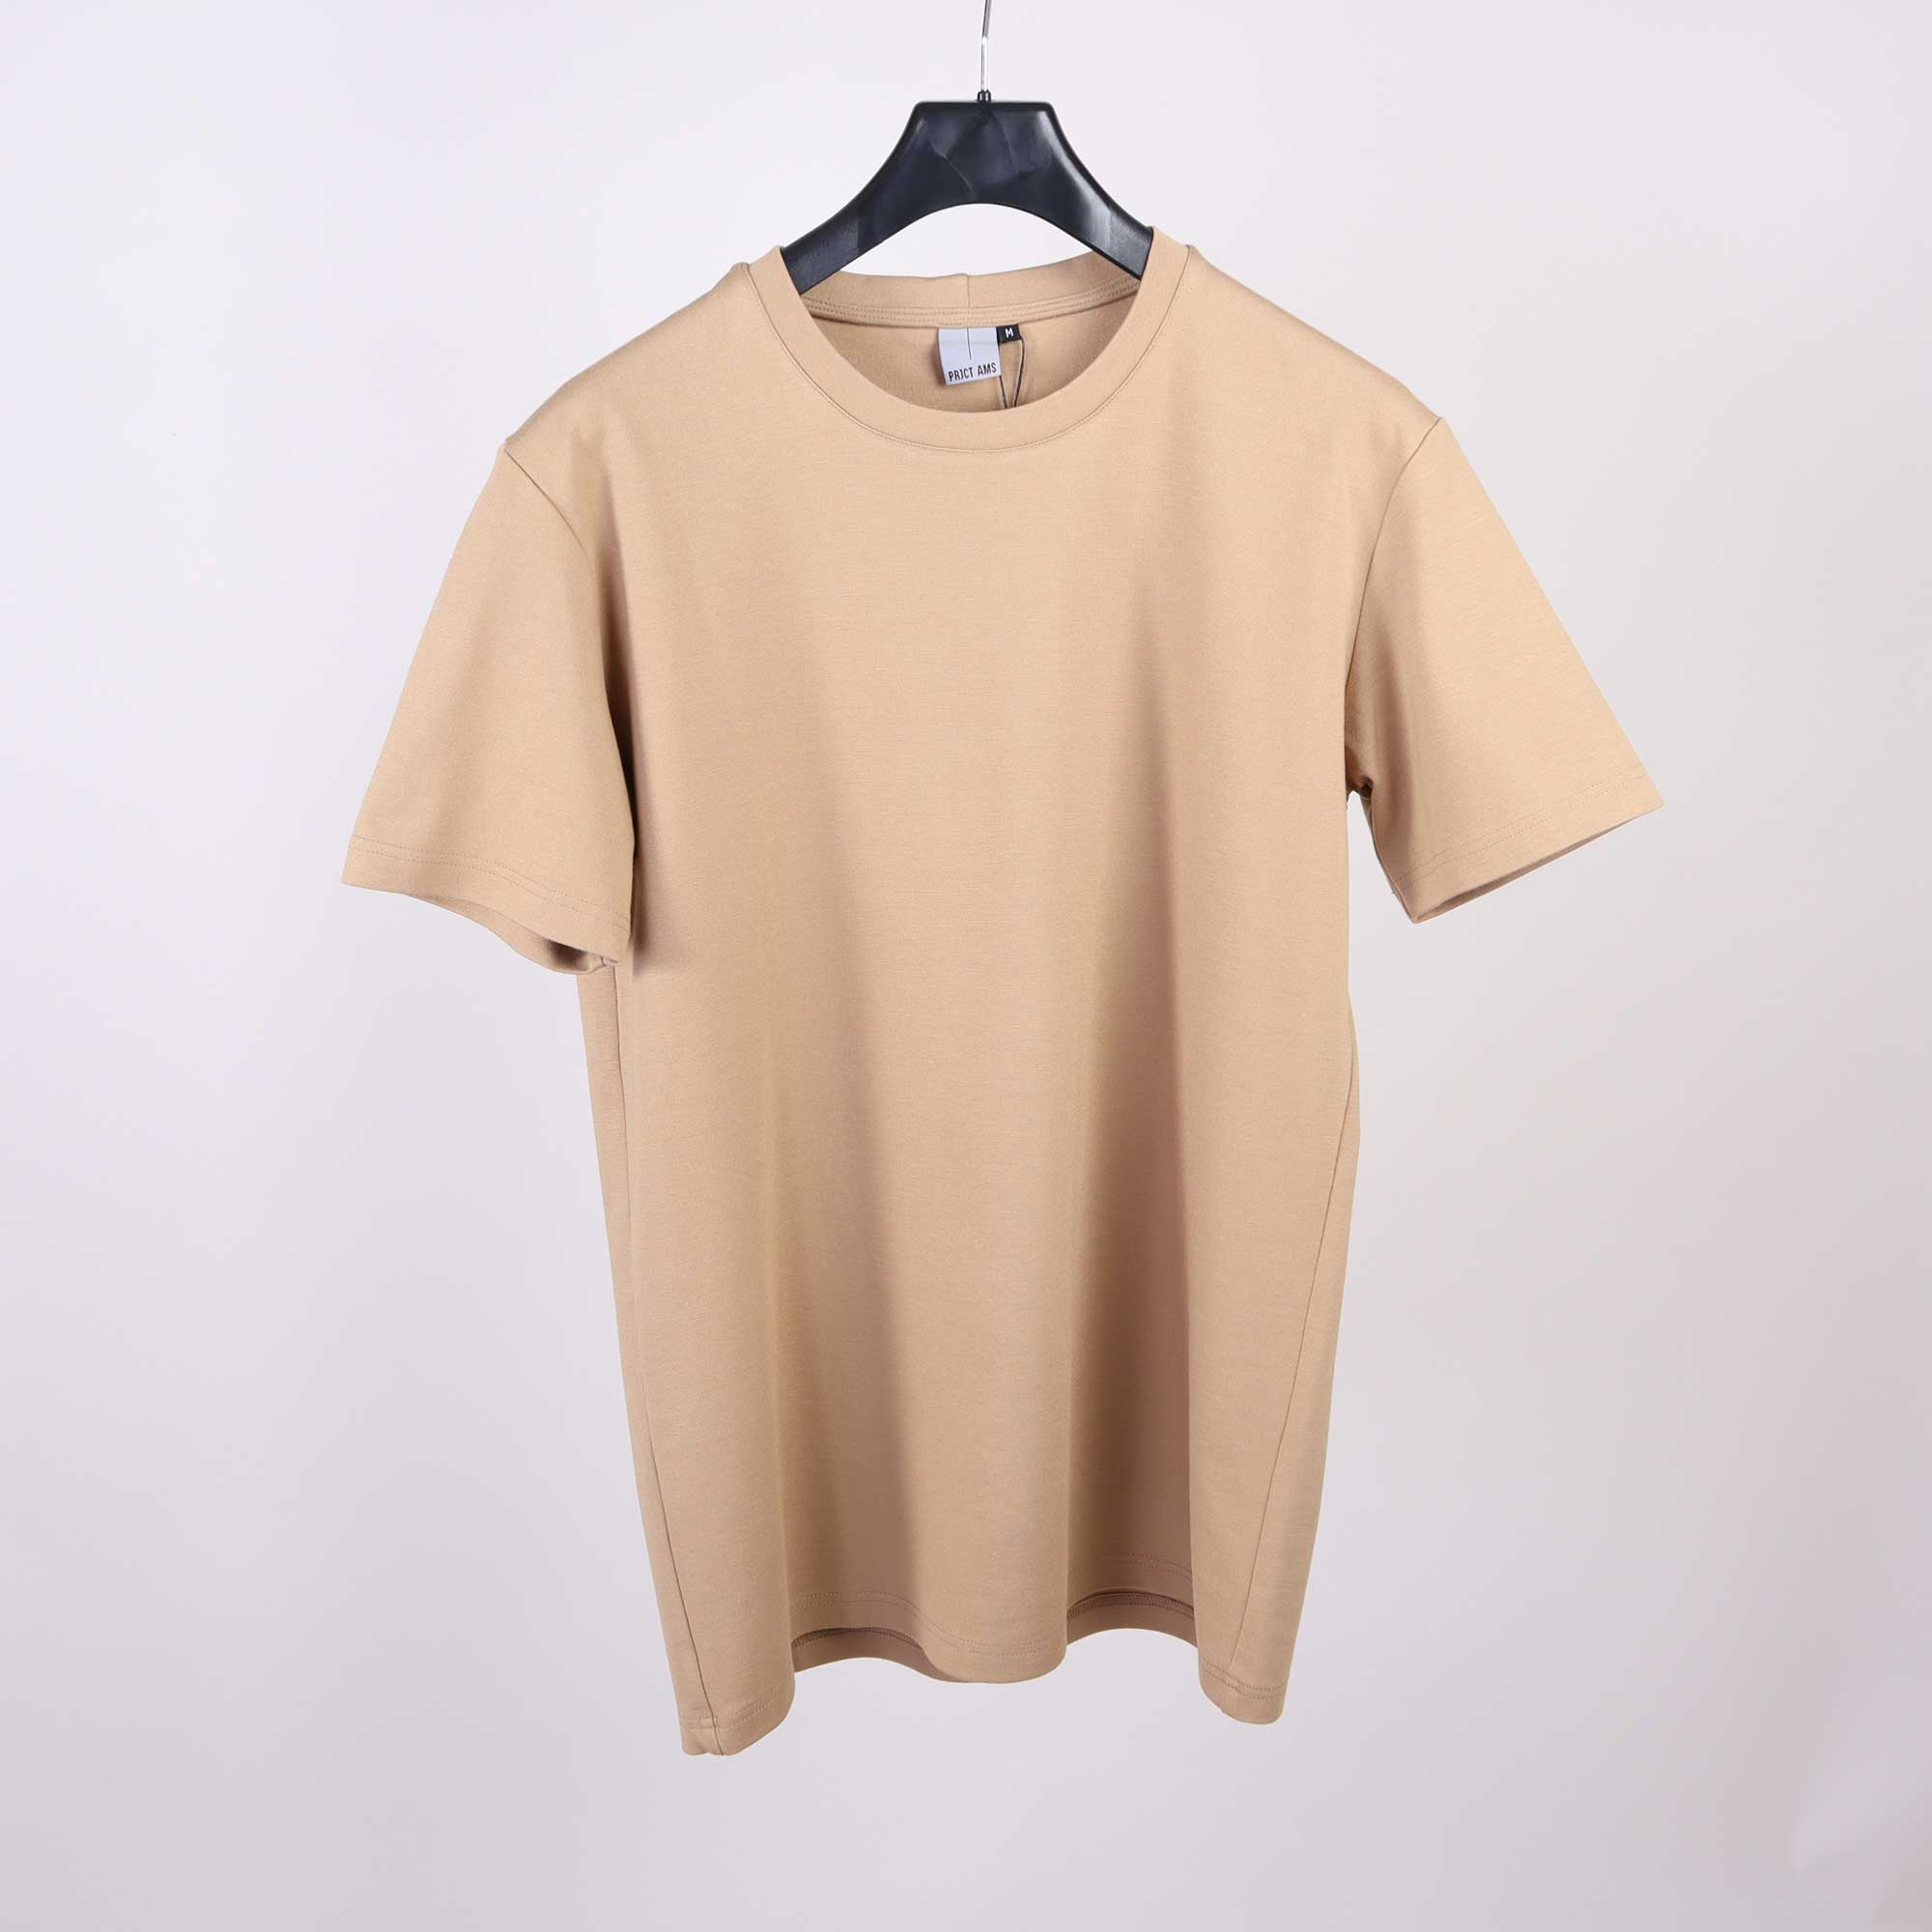 punto-tee-beige-product-1